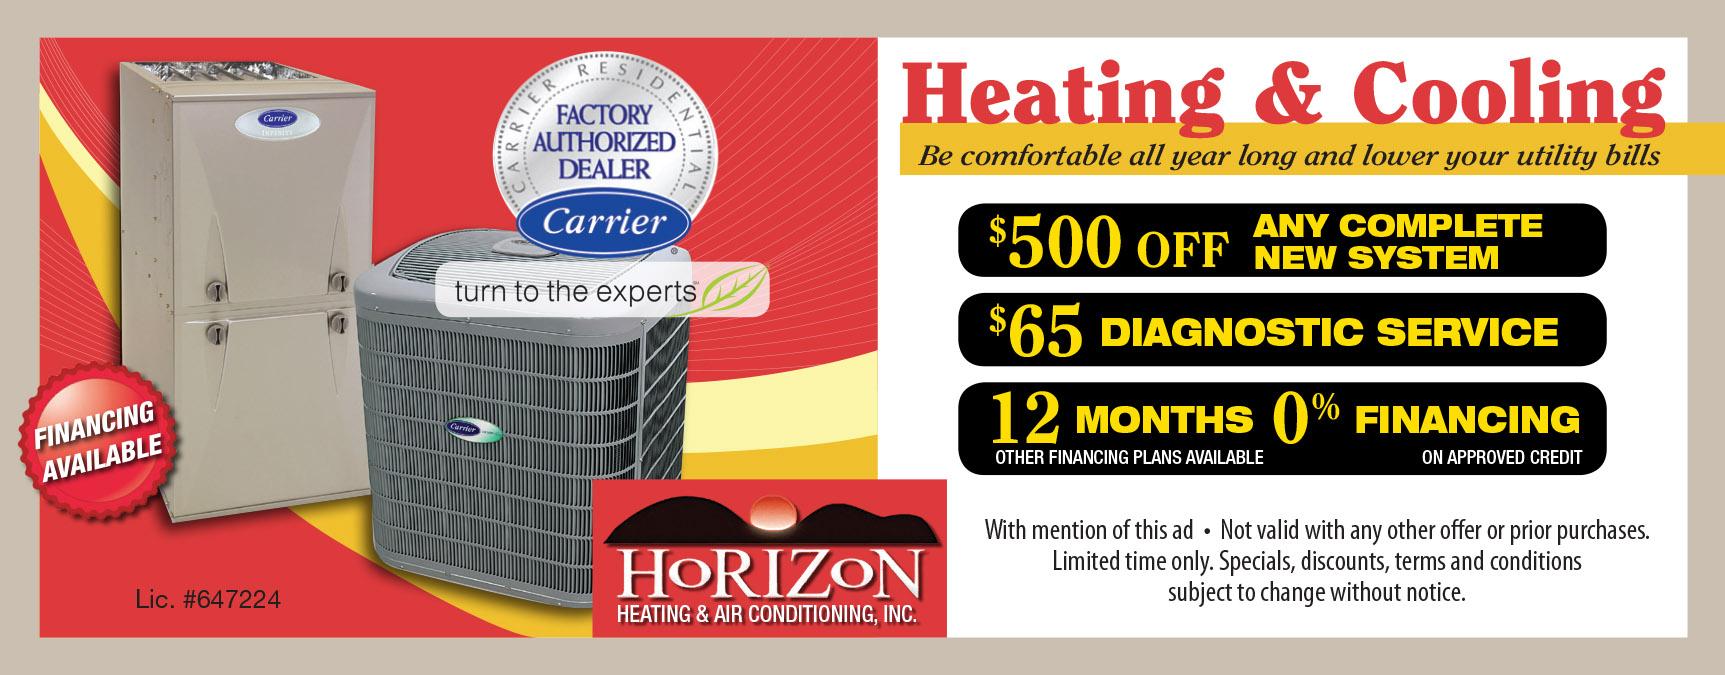 Horizon Heating&Air_Offer_Reg-2_01-19.jpg